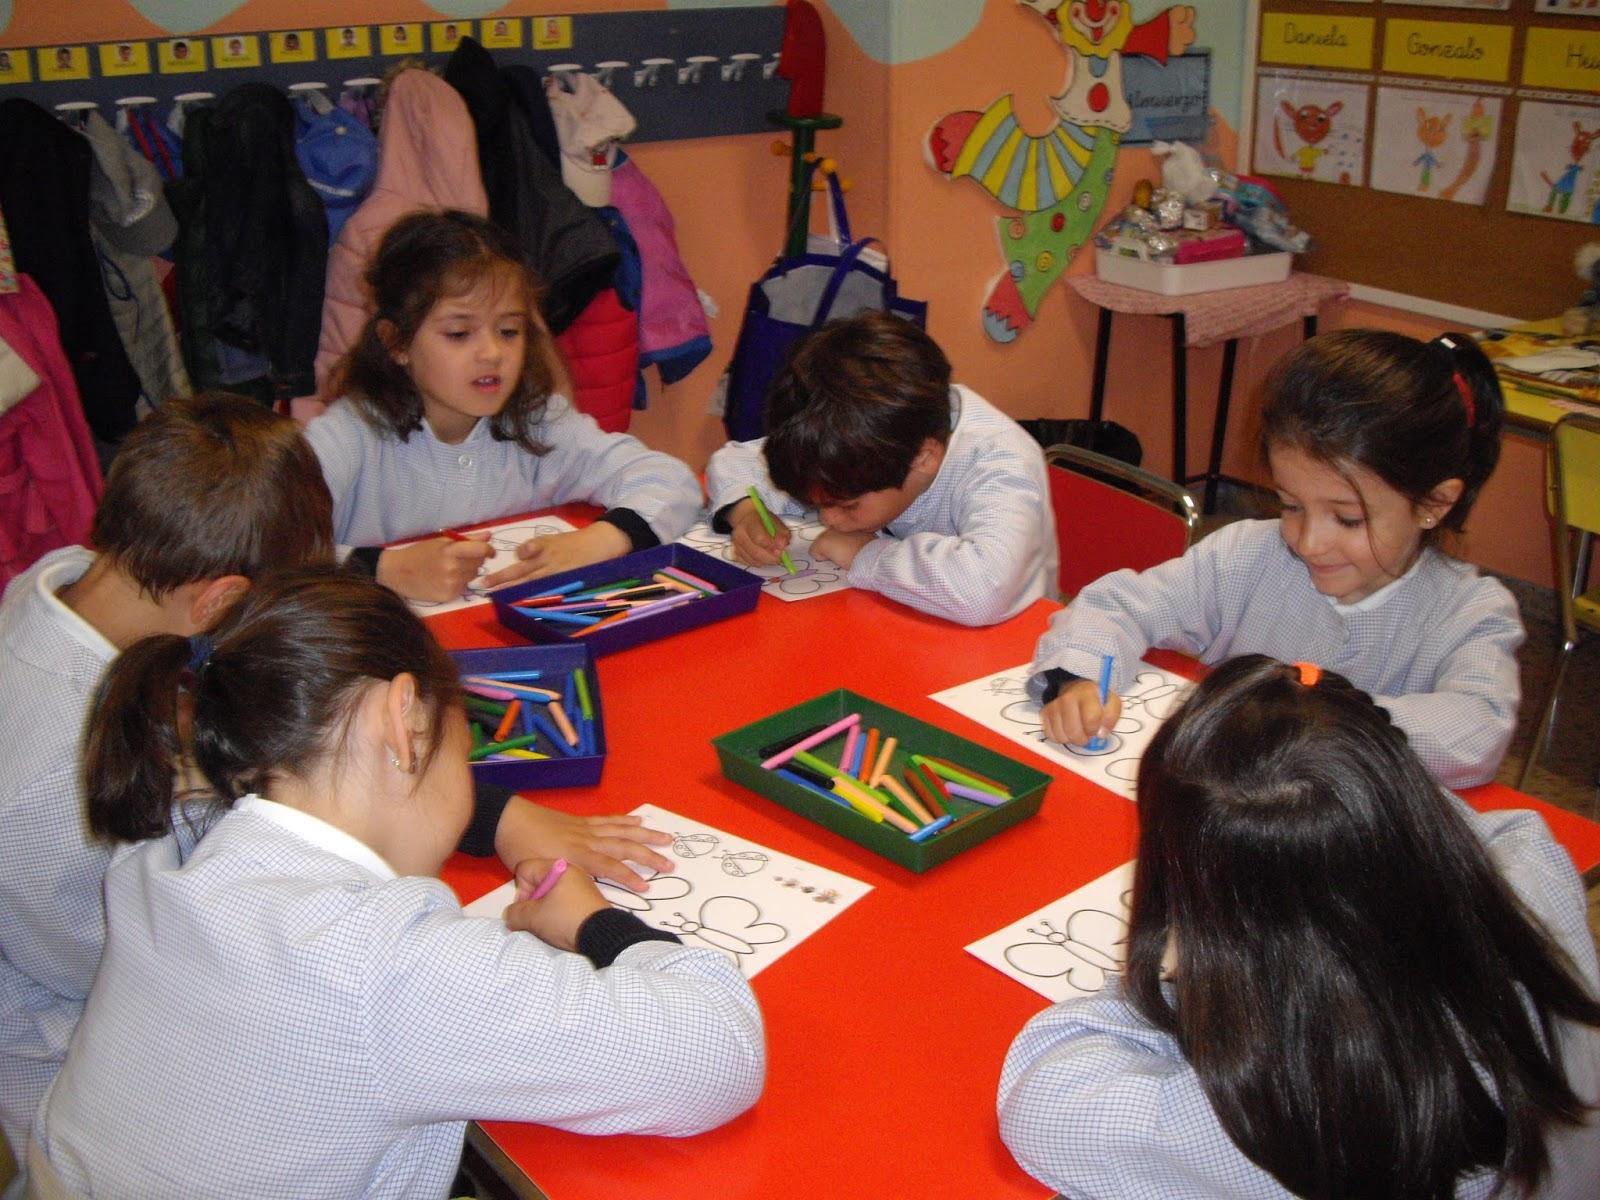 Agustinas Valladolid - 2017 - Infantil 5 - Rincones